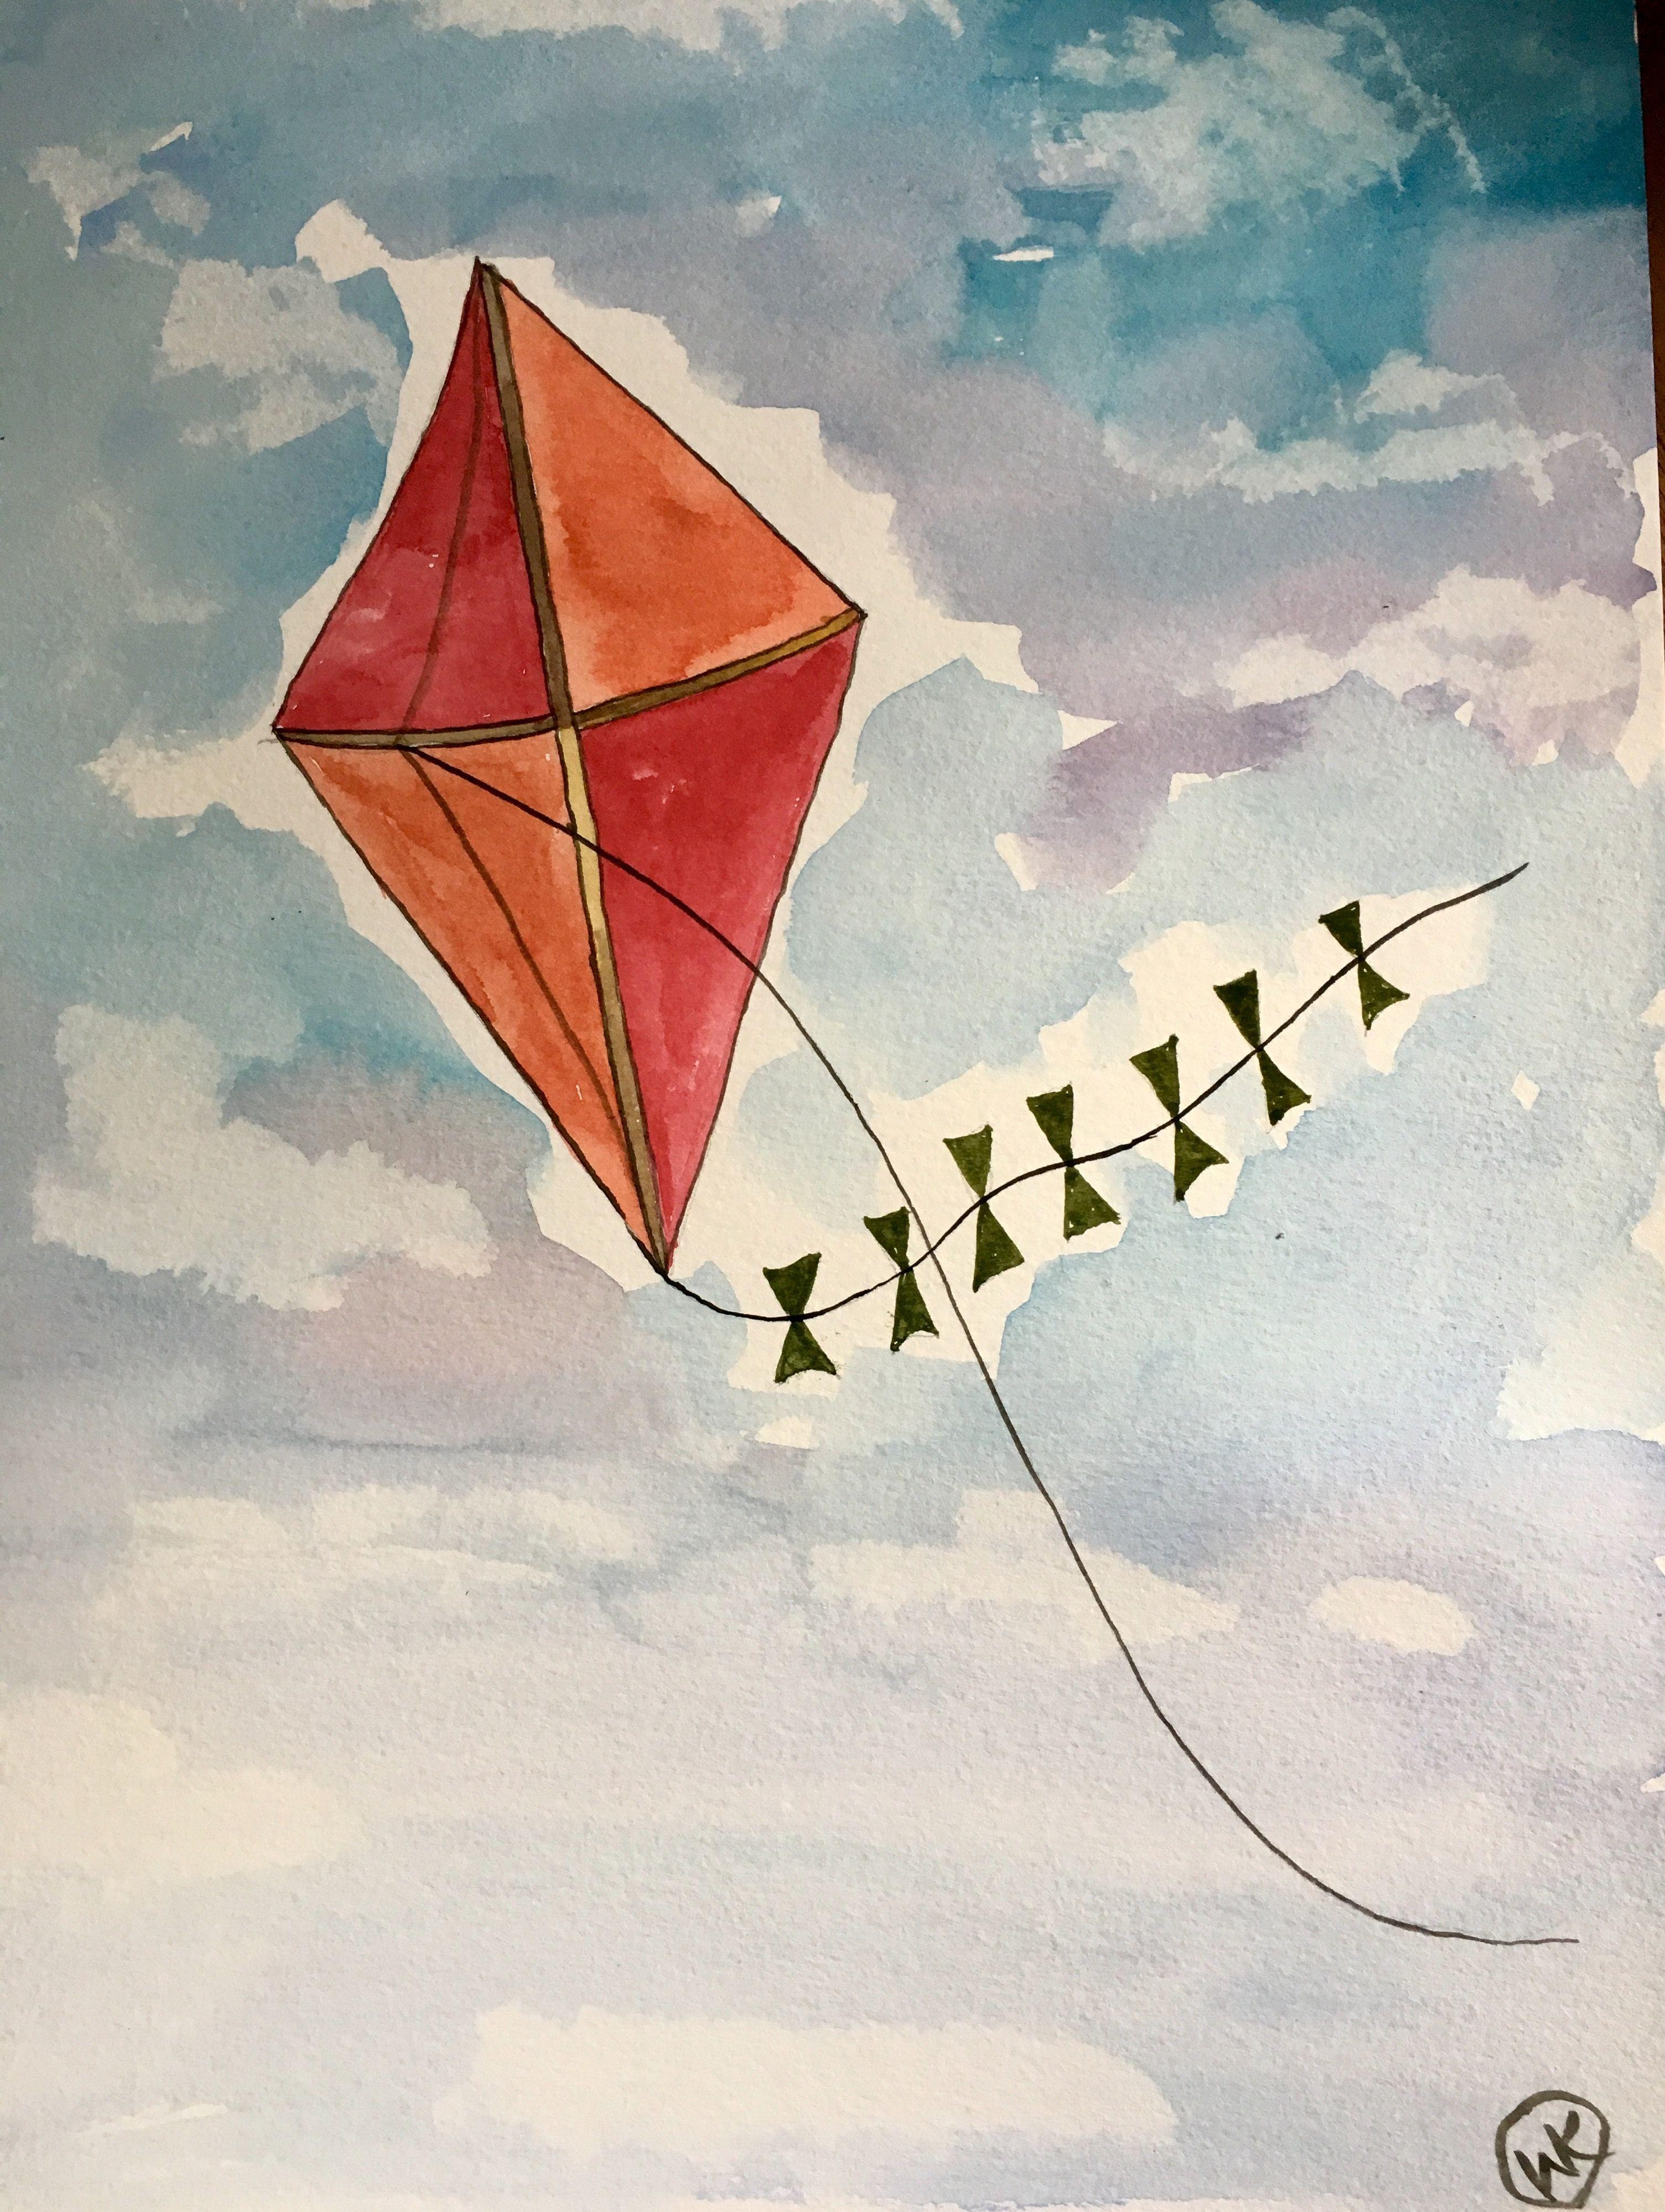 Kite Watercolor 9x12 Drawing Artwork Painting Kite